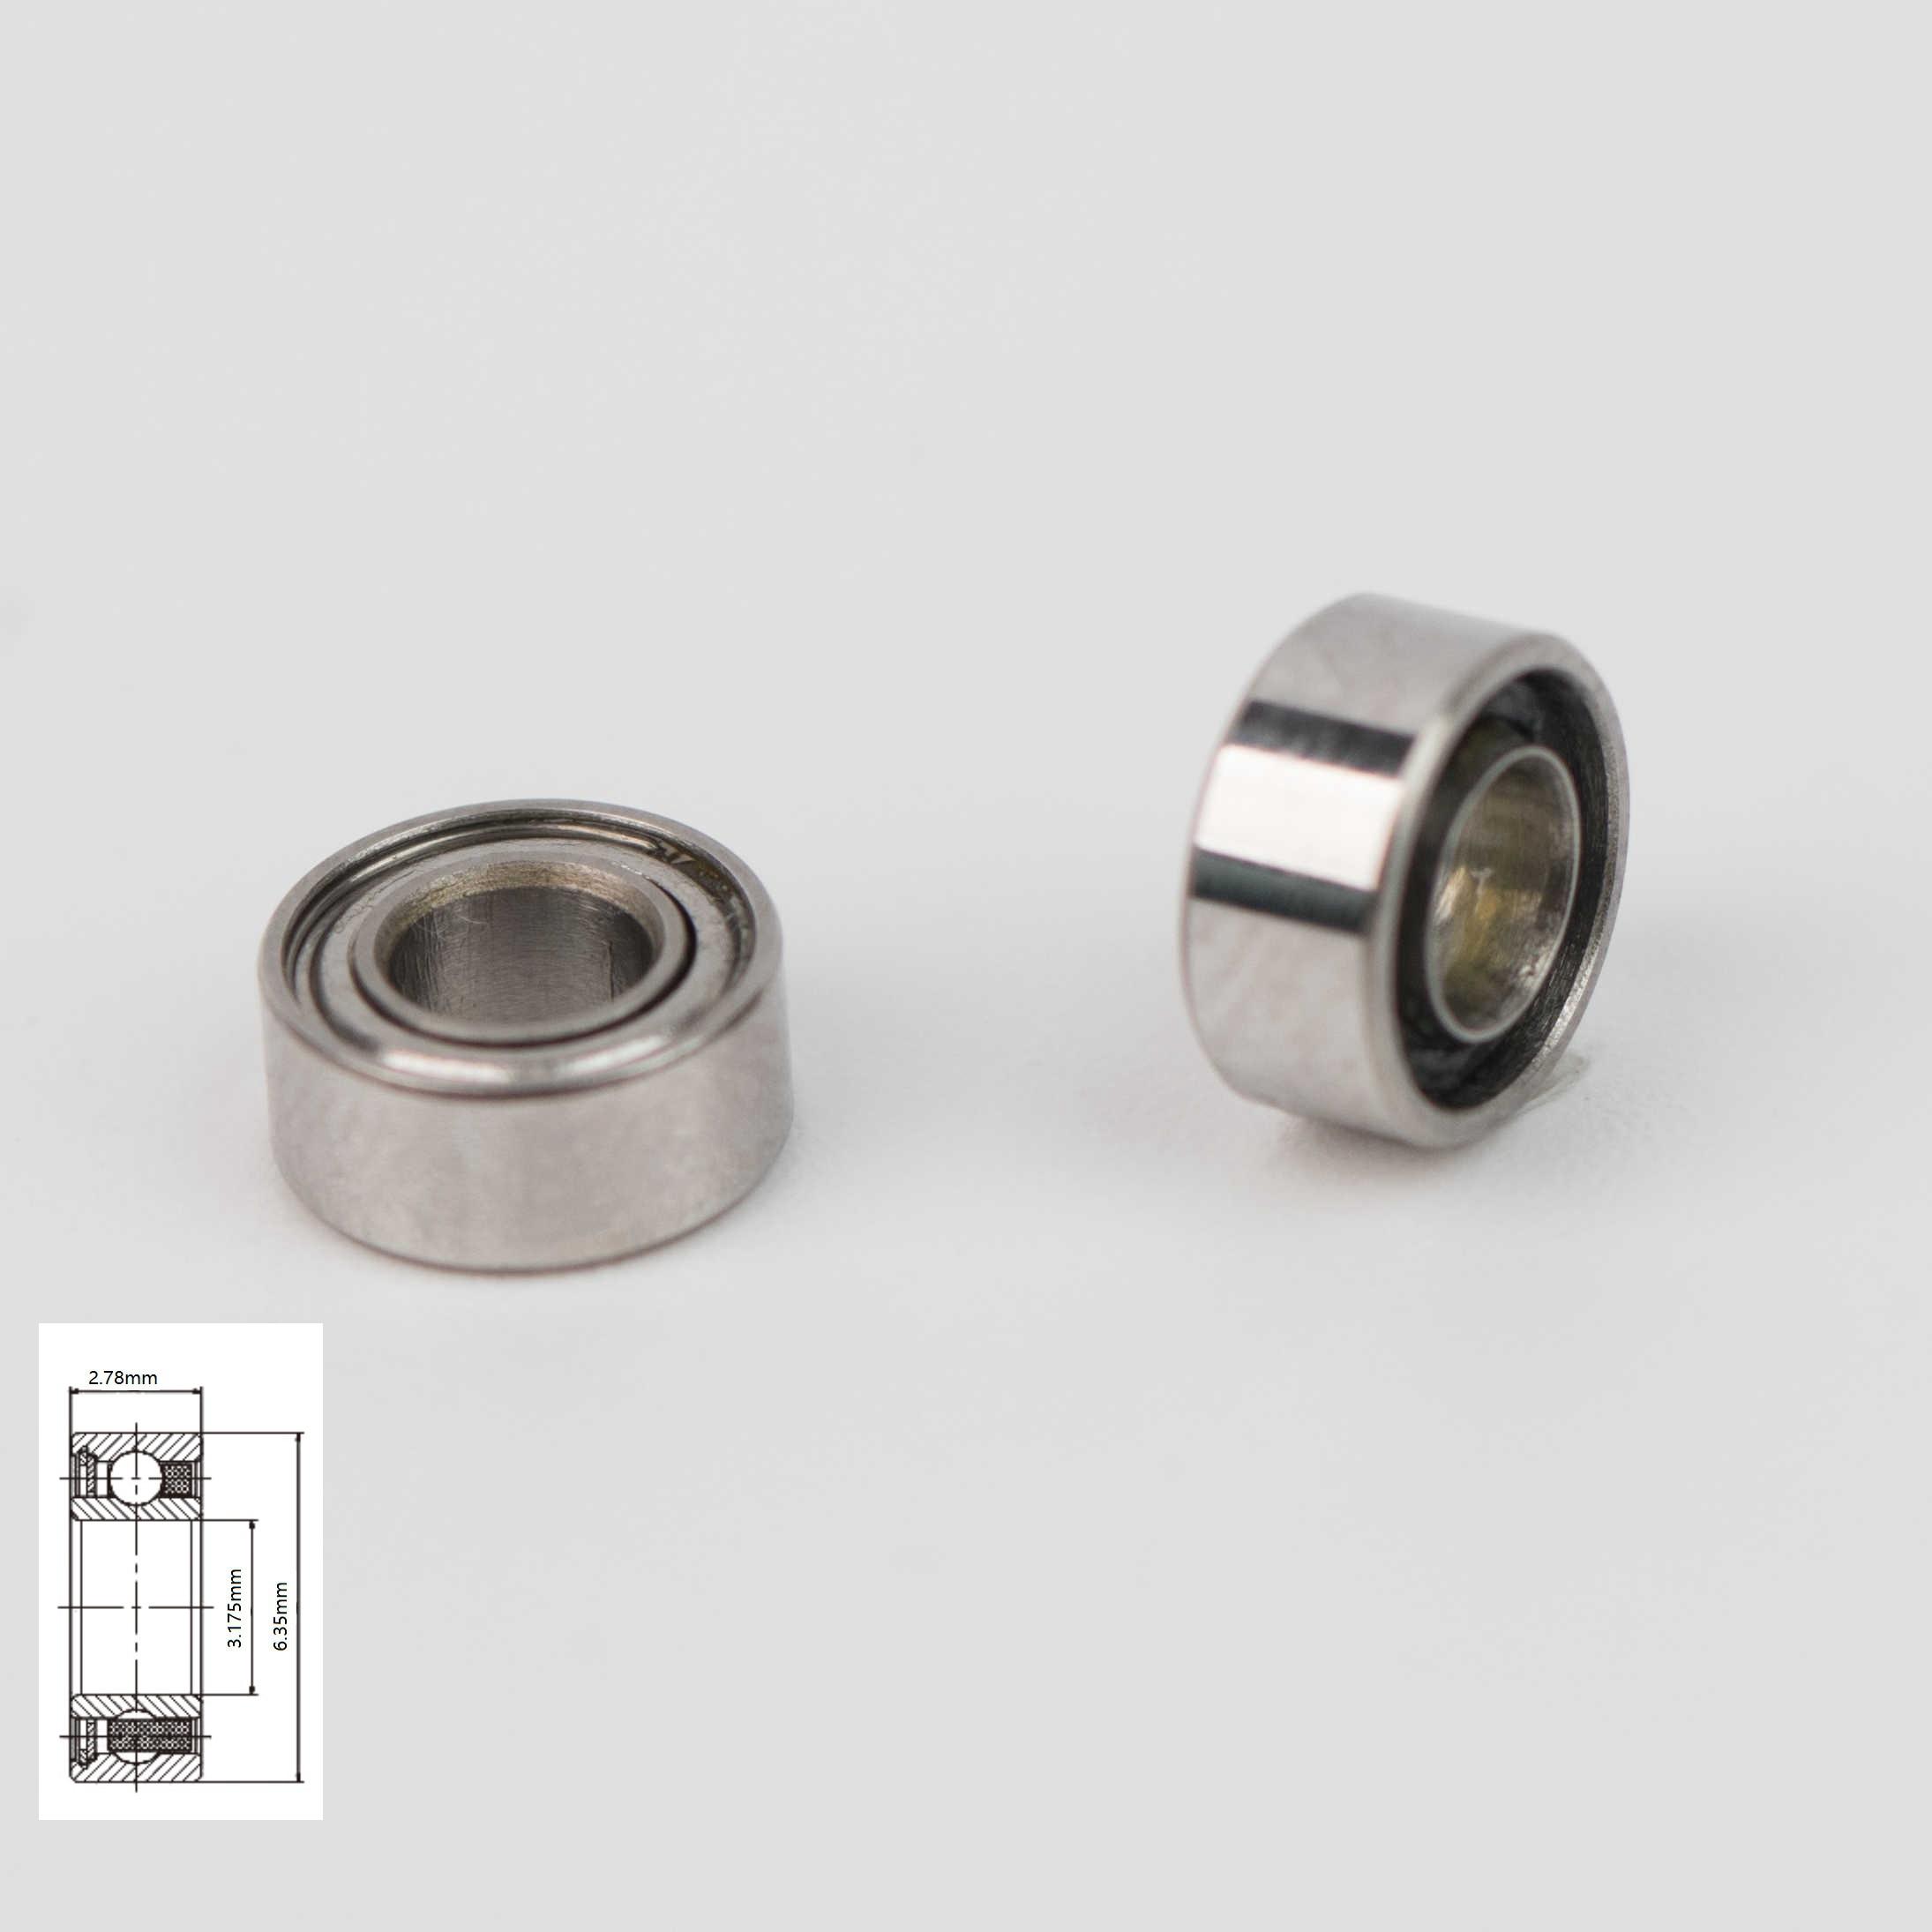 10pcs high speed Sirona T2/T3 handpiece turbine cartridge rotor bearings SR144TLZWNBearings   -